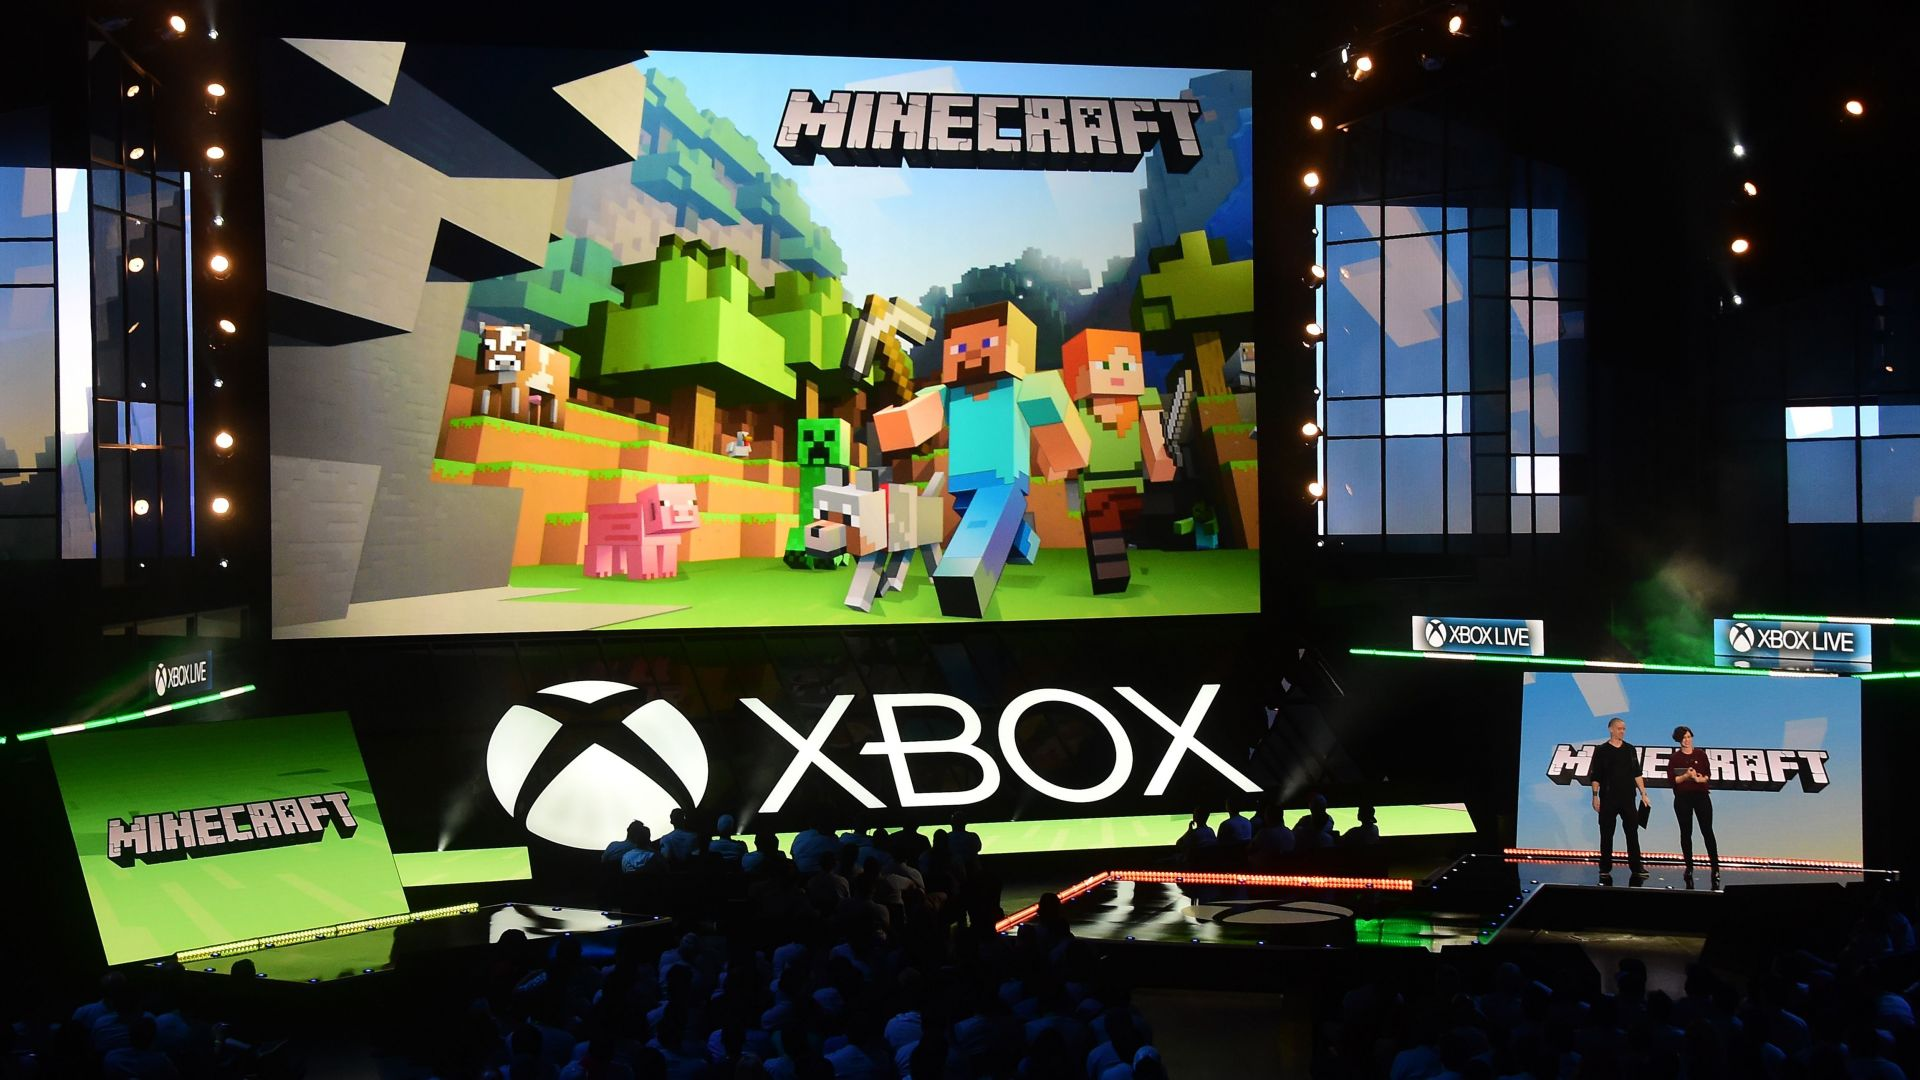 Xbox One X 4k Magic: Wallpaper Minecraft, 4k, E3 2017, Xbox One X, Games #13772